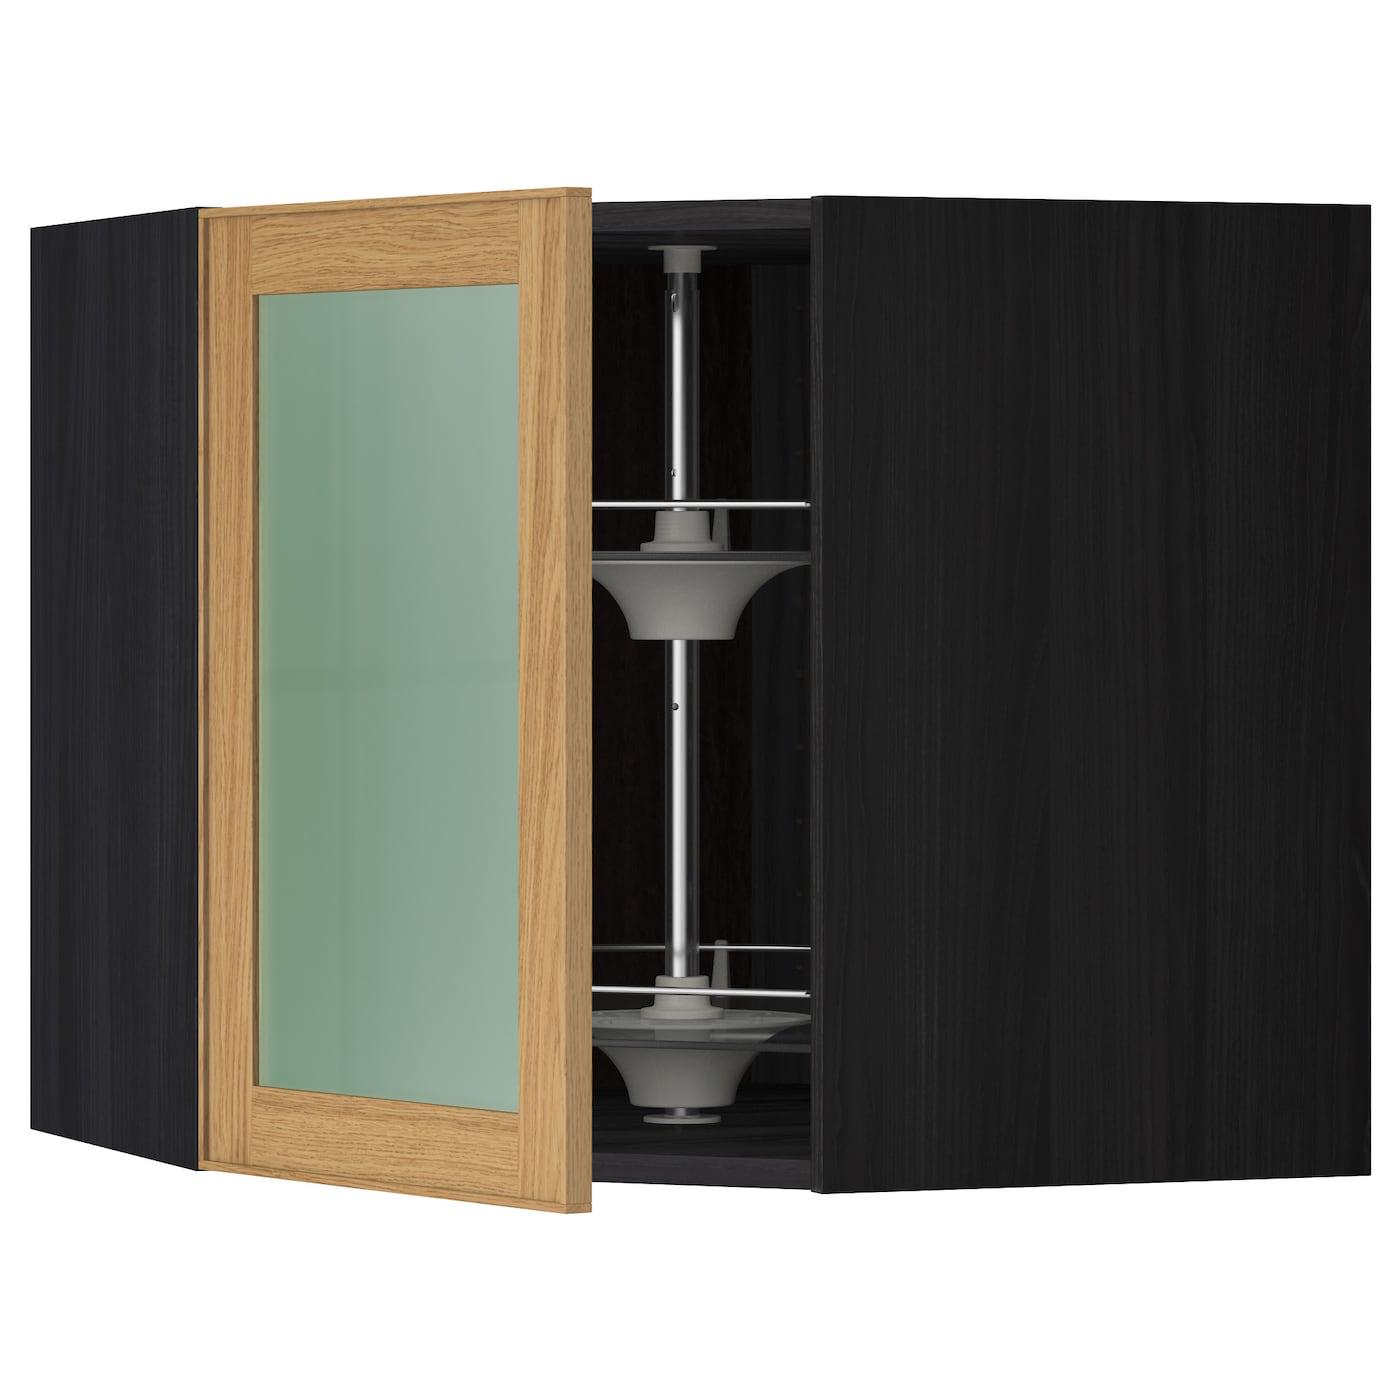 metod bovenhoekkast carrousel vitrinedeur zwart ekestad eiken 68 x 60 cm ikea. Black Bedroom Furniture Sets. Home Design Ideas